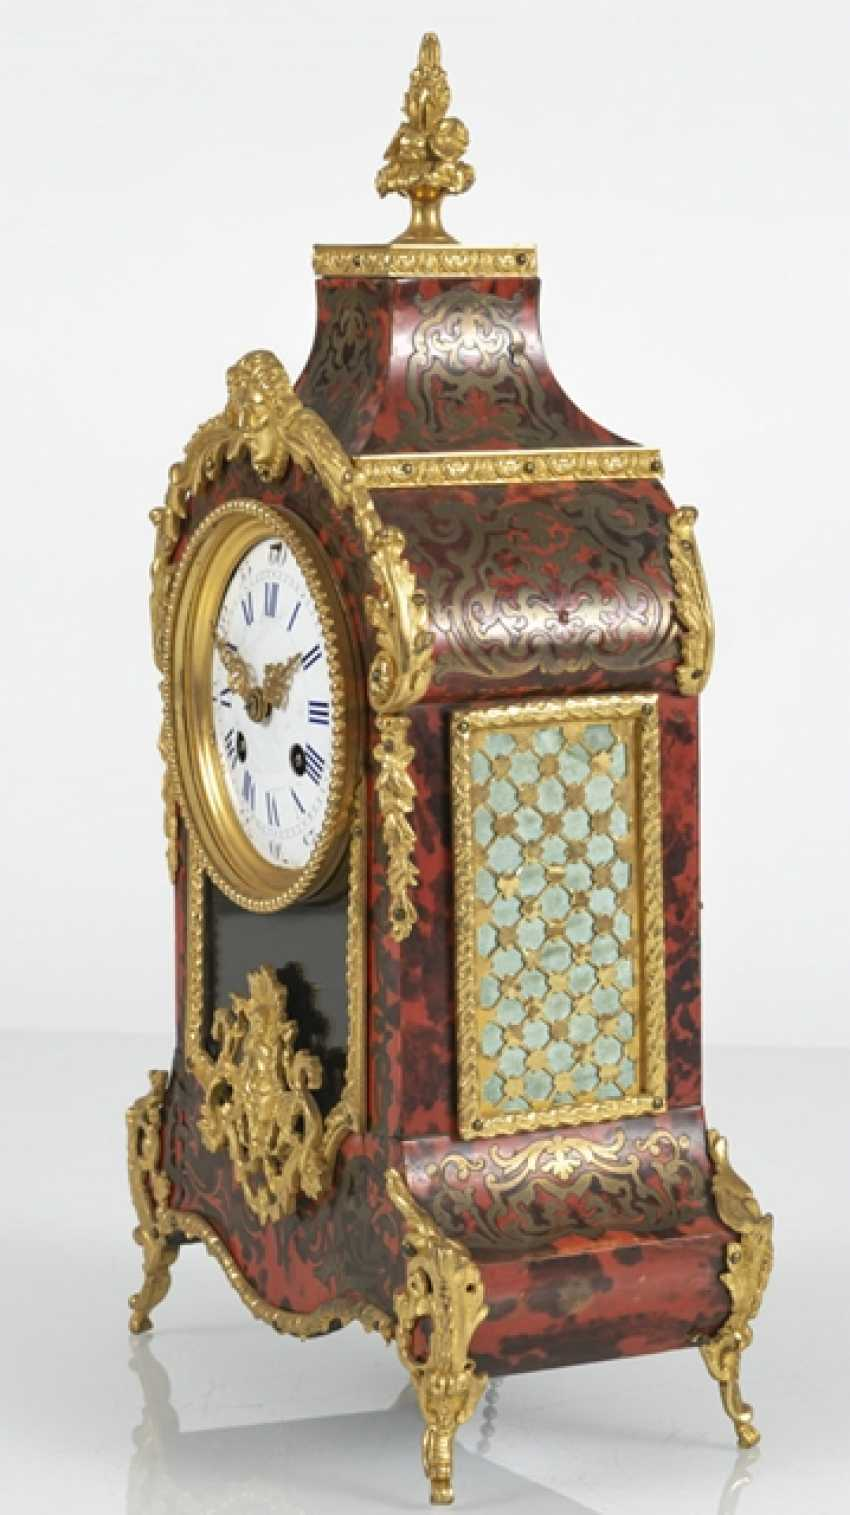 Small Pendulum Clock, Boulle Style - photo 2